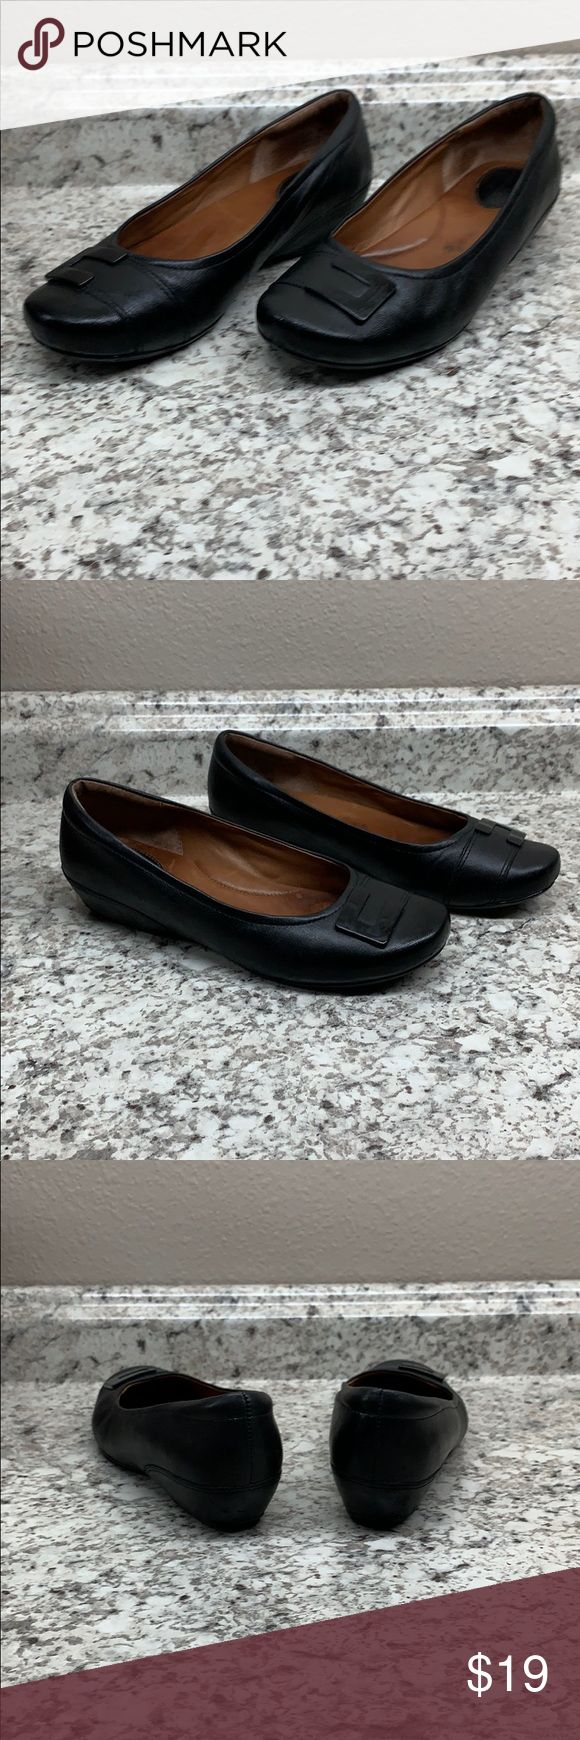 NWOT Black Leather Flats   Black leather flats, Leather